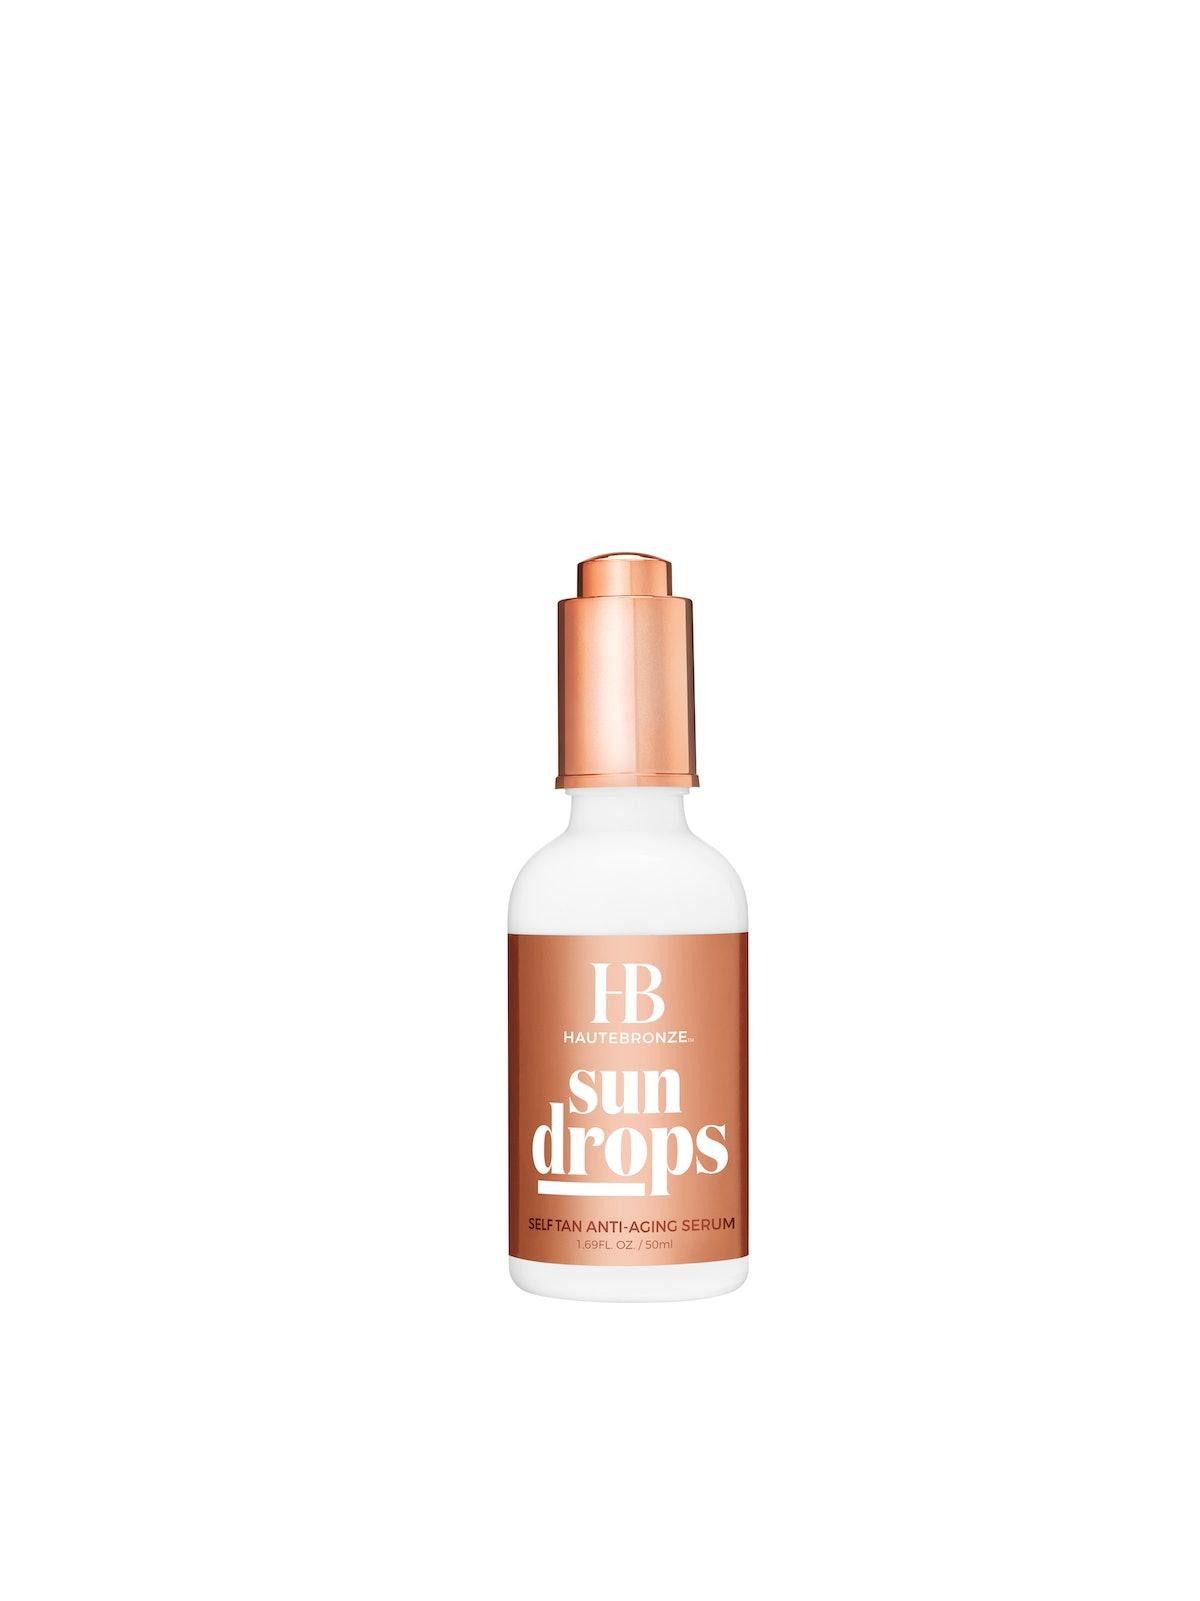 HauteBronze Sun Drops Self Tan Anti-Aging Serum